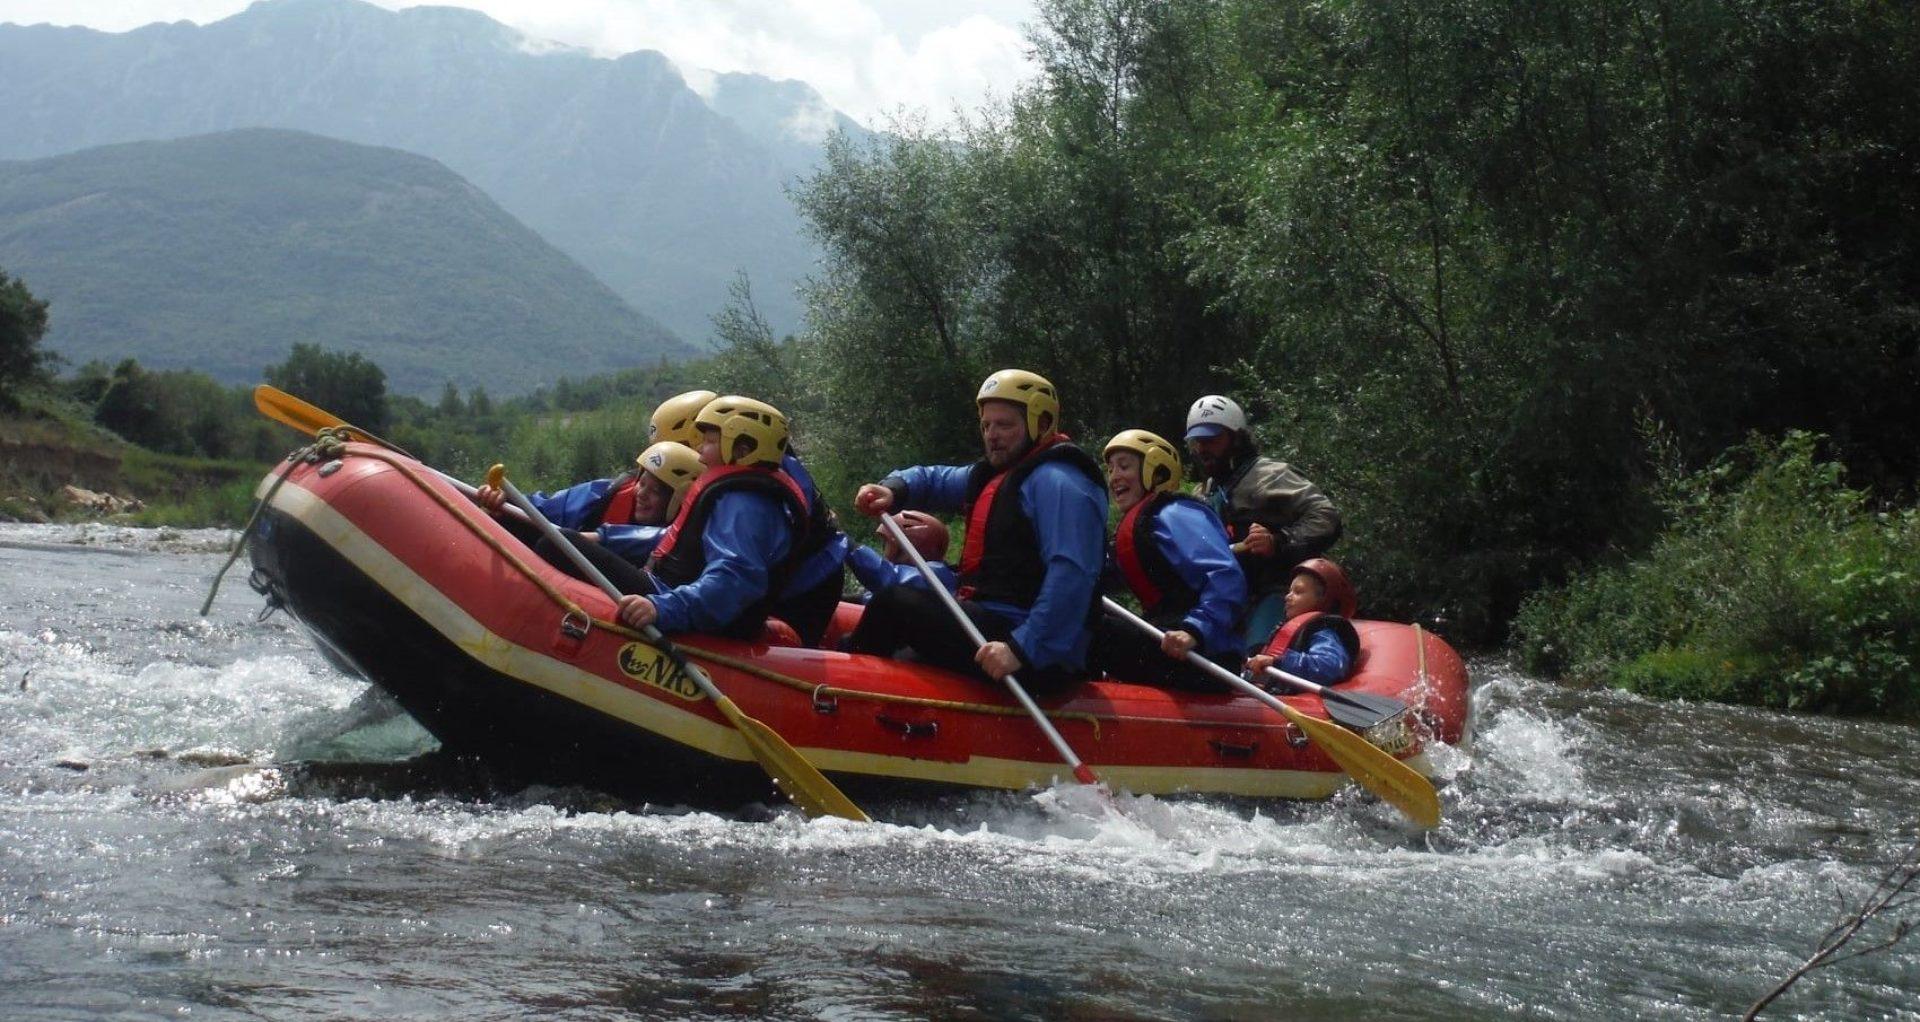 Rafting Fiume Calore